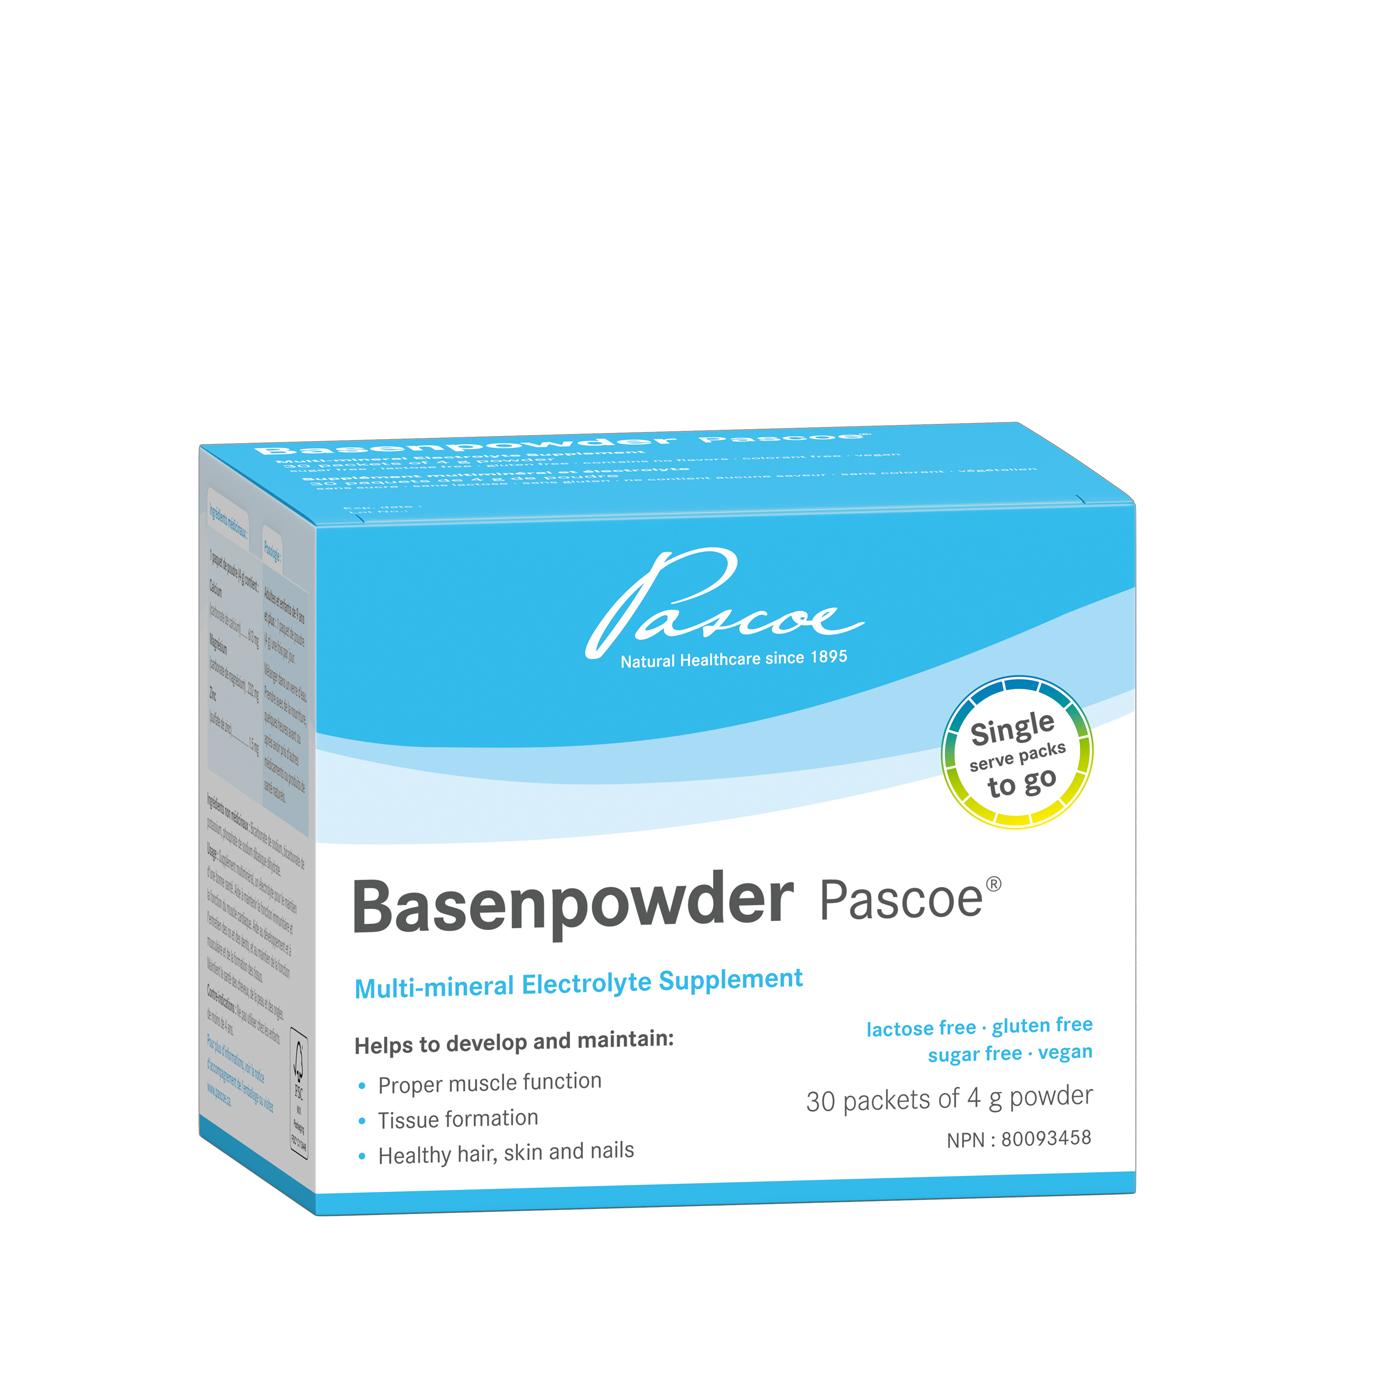 Basenpowder Pascoe 30x 4g Sachets Multimineral powder – Electrolyte